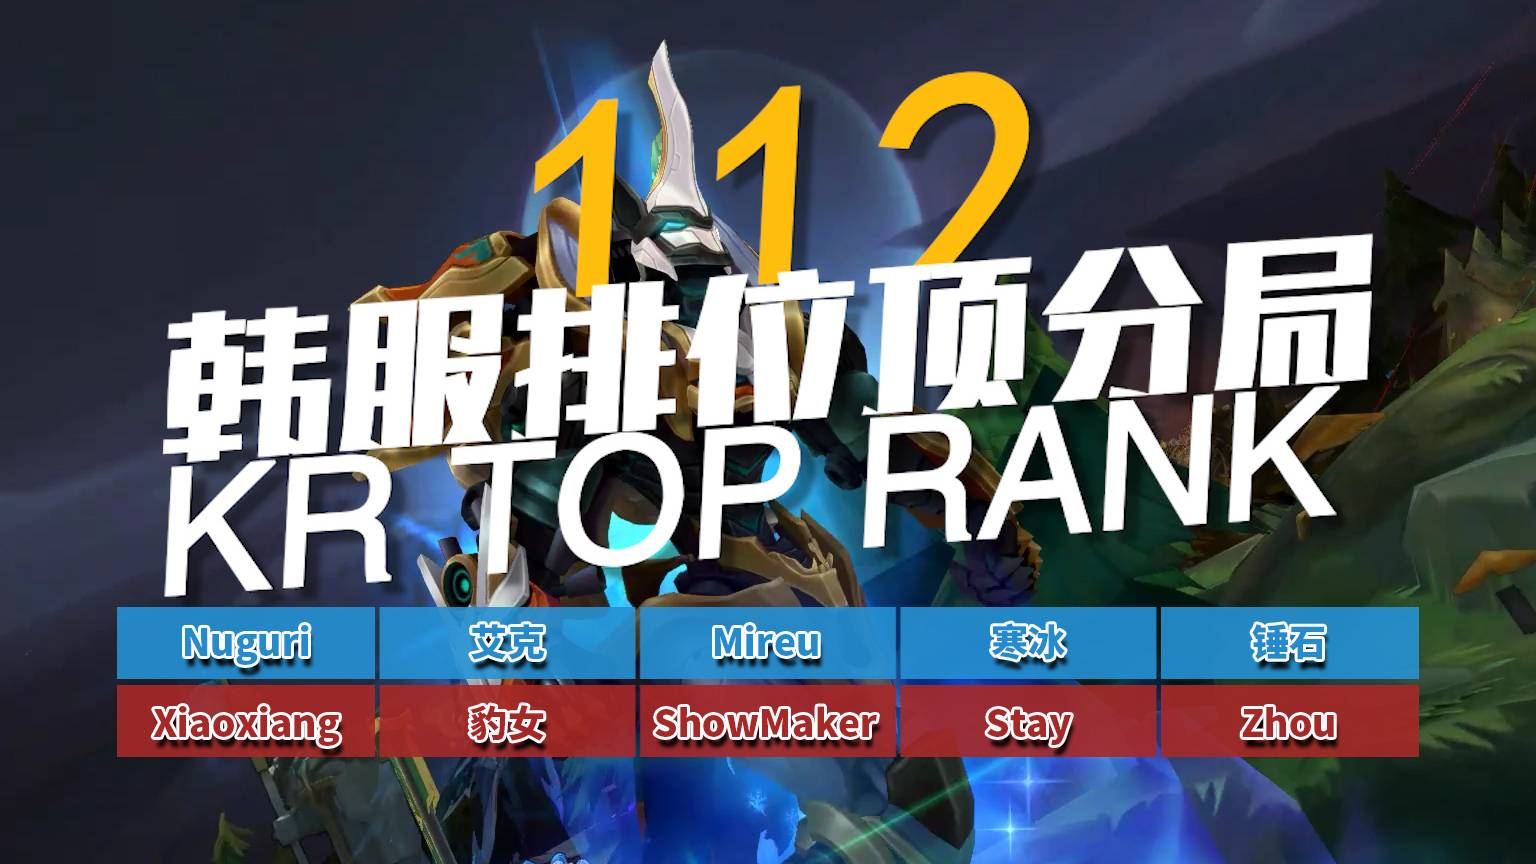 韩服排位顶分局#112:Nuguri、Mireu、Xiaoxiang、ShowMaker、Stay